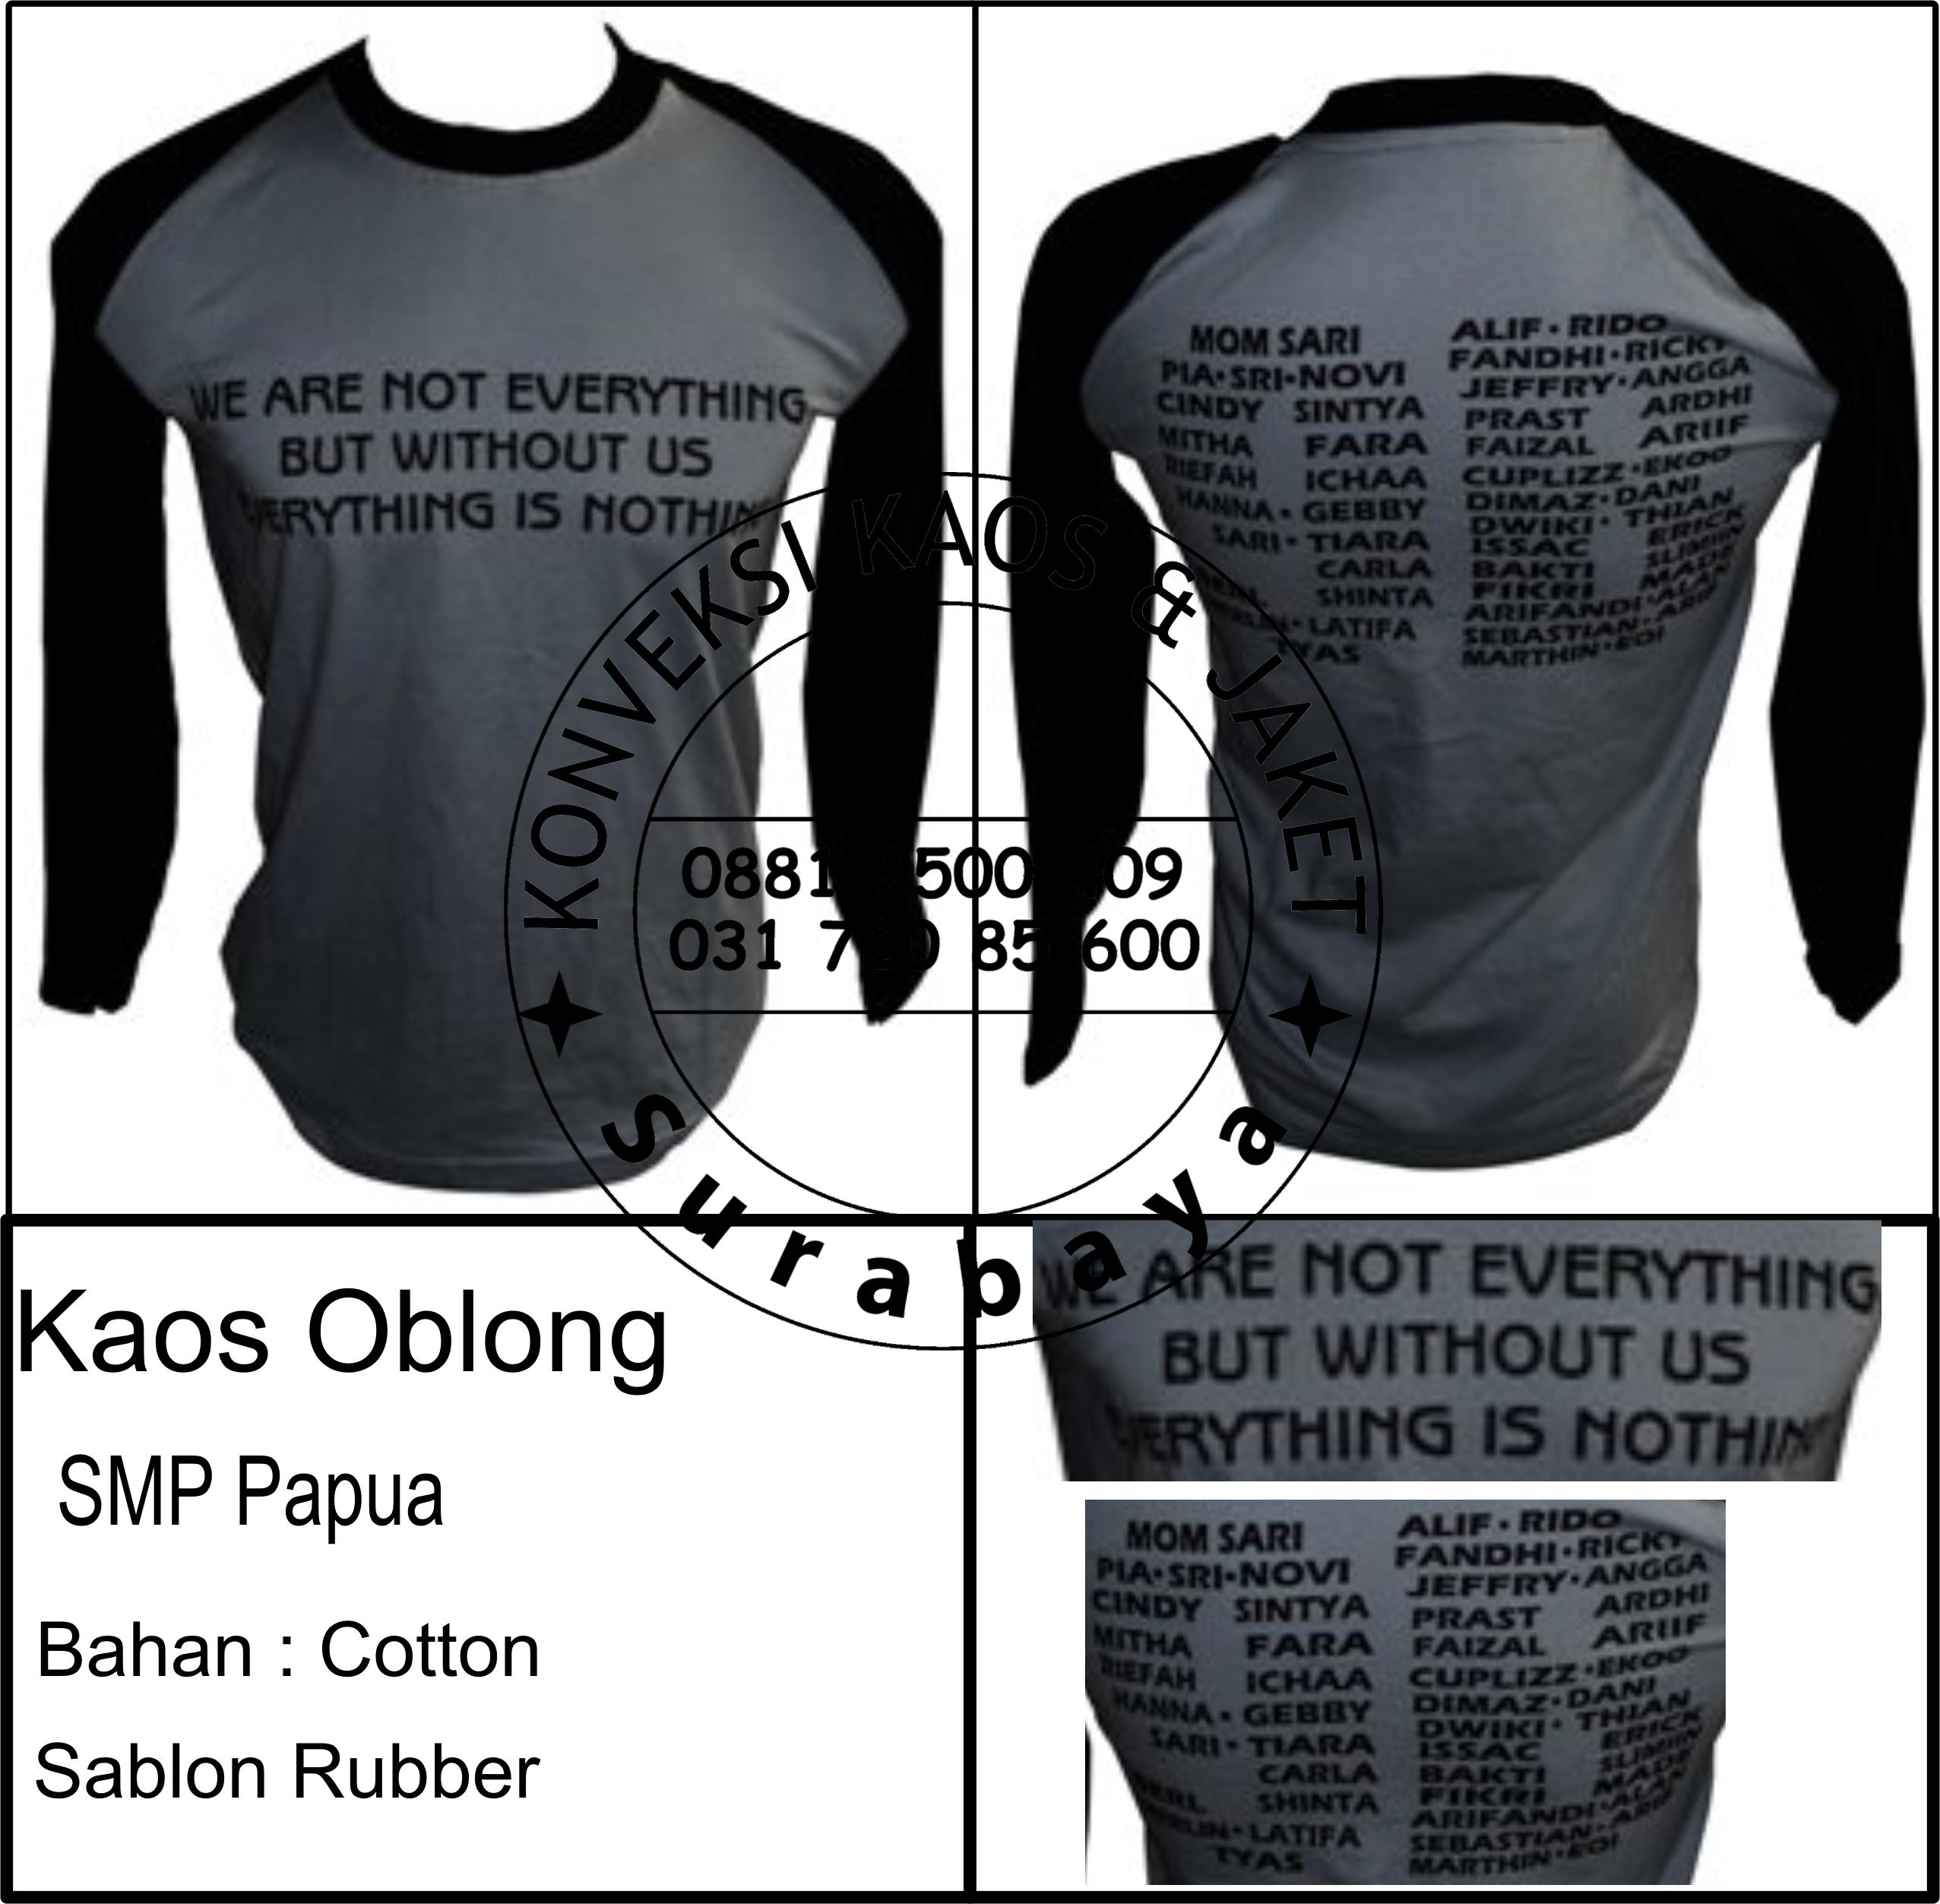 Kaos Oblong SMP Papua Bahan : Cotton Sablon Rubber